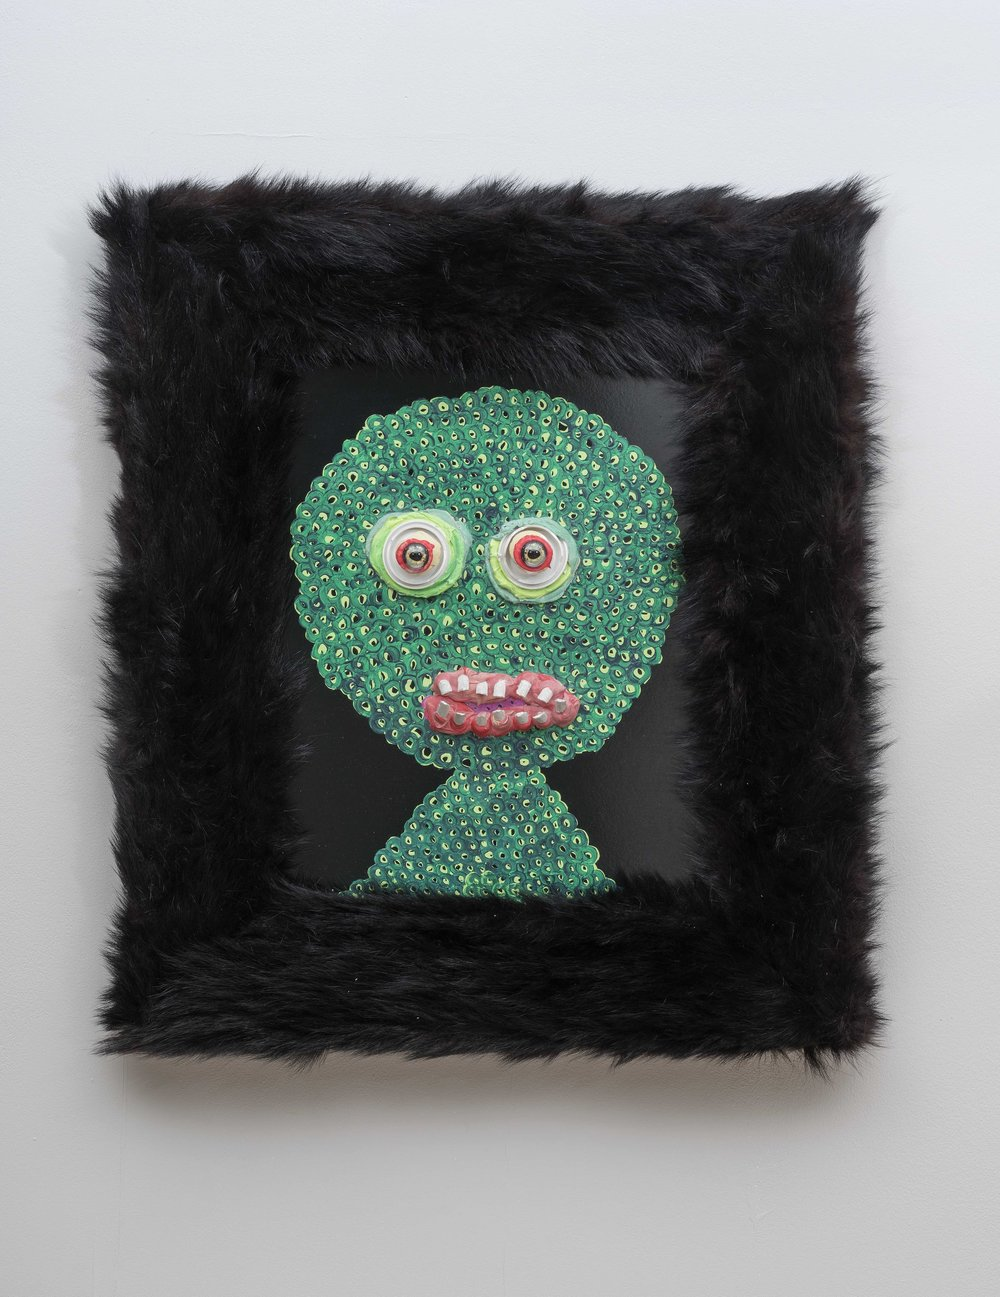 Emotional Dinosaur 3, 75 x 63 x 10 cm, 2018.